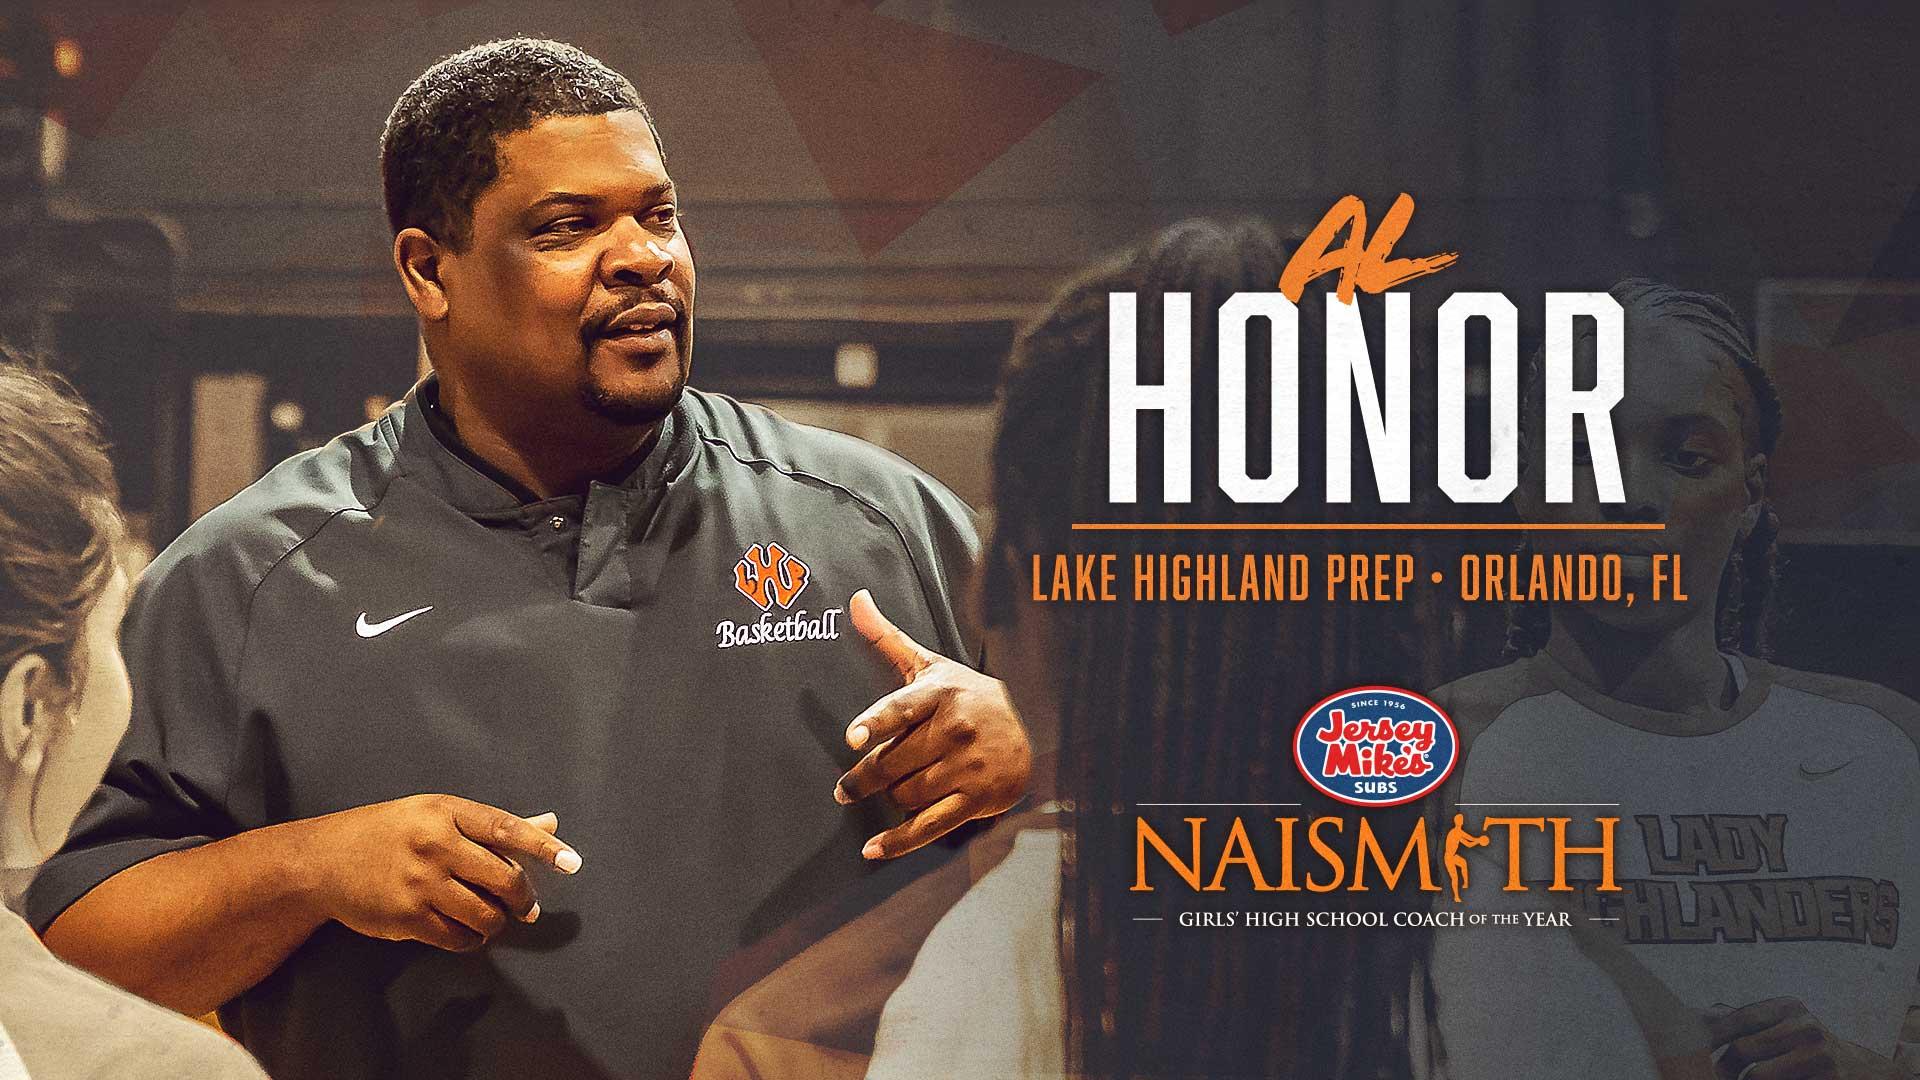 Coach Al Honor